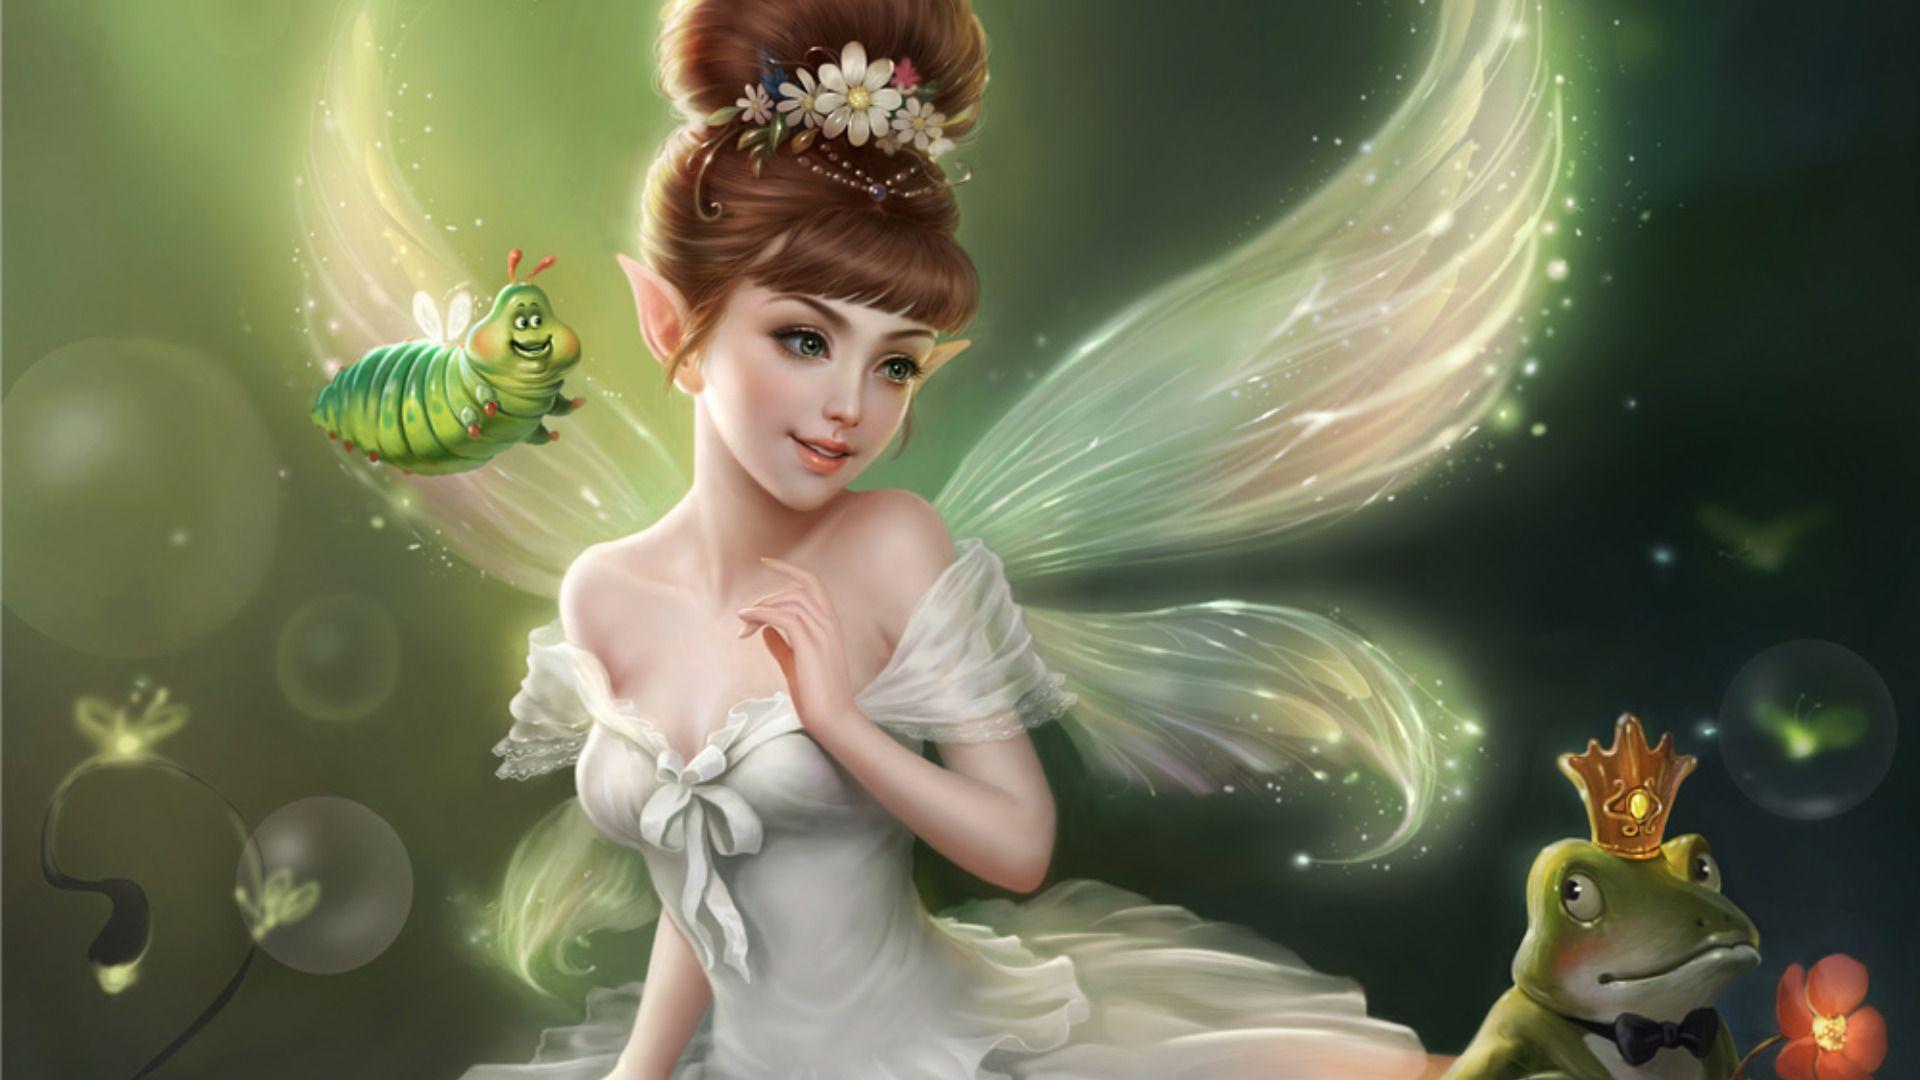 Beautiful Fairies Wallpapers - Wallpaper Cave